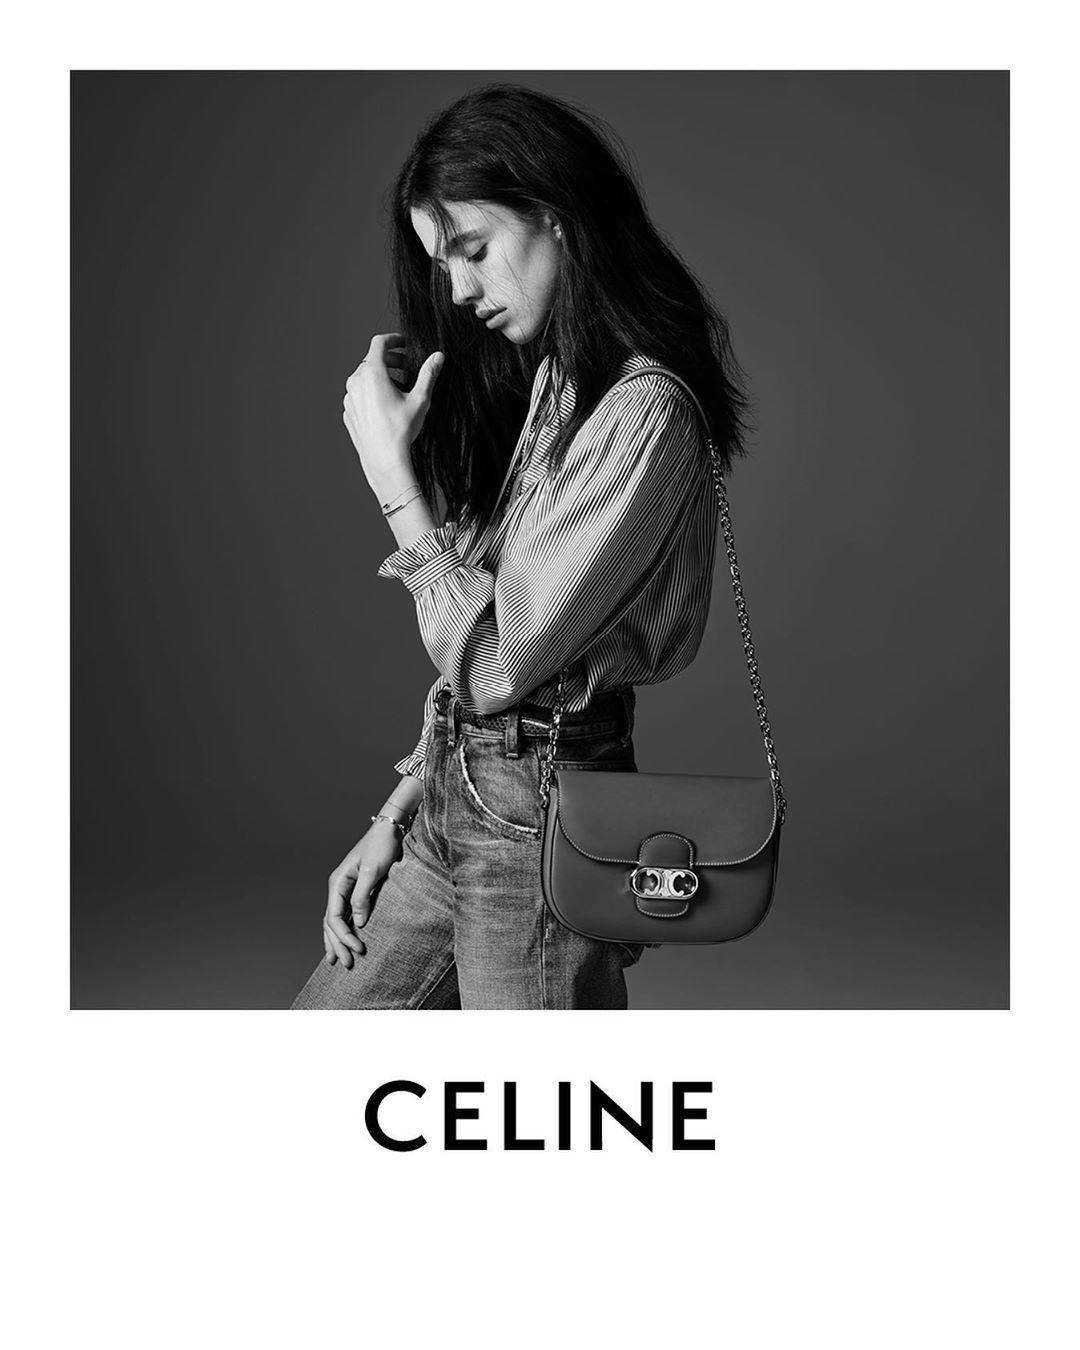 Celine Margaret Quailey Fall 2019 Fashion Ad Campaign by Hedi Slimane